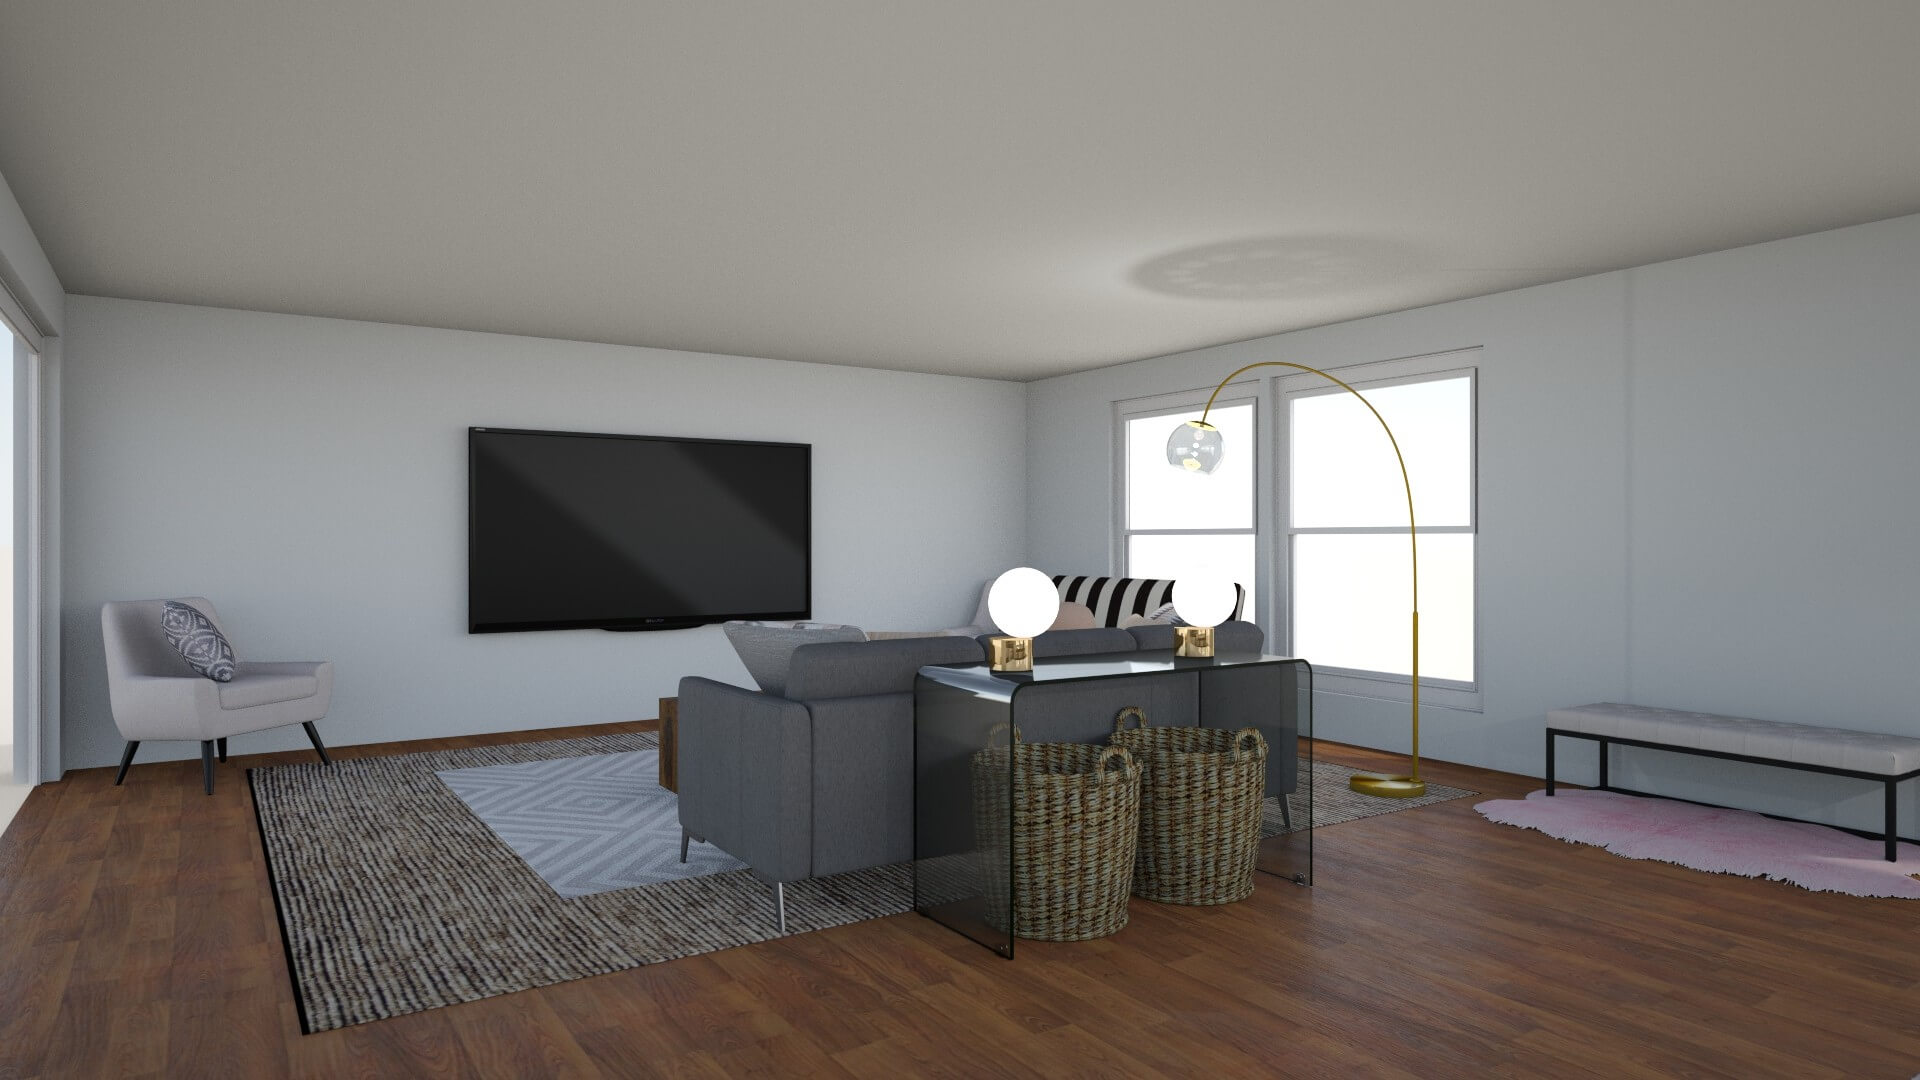 Option 1: Grey Sofa